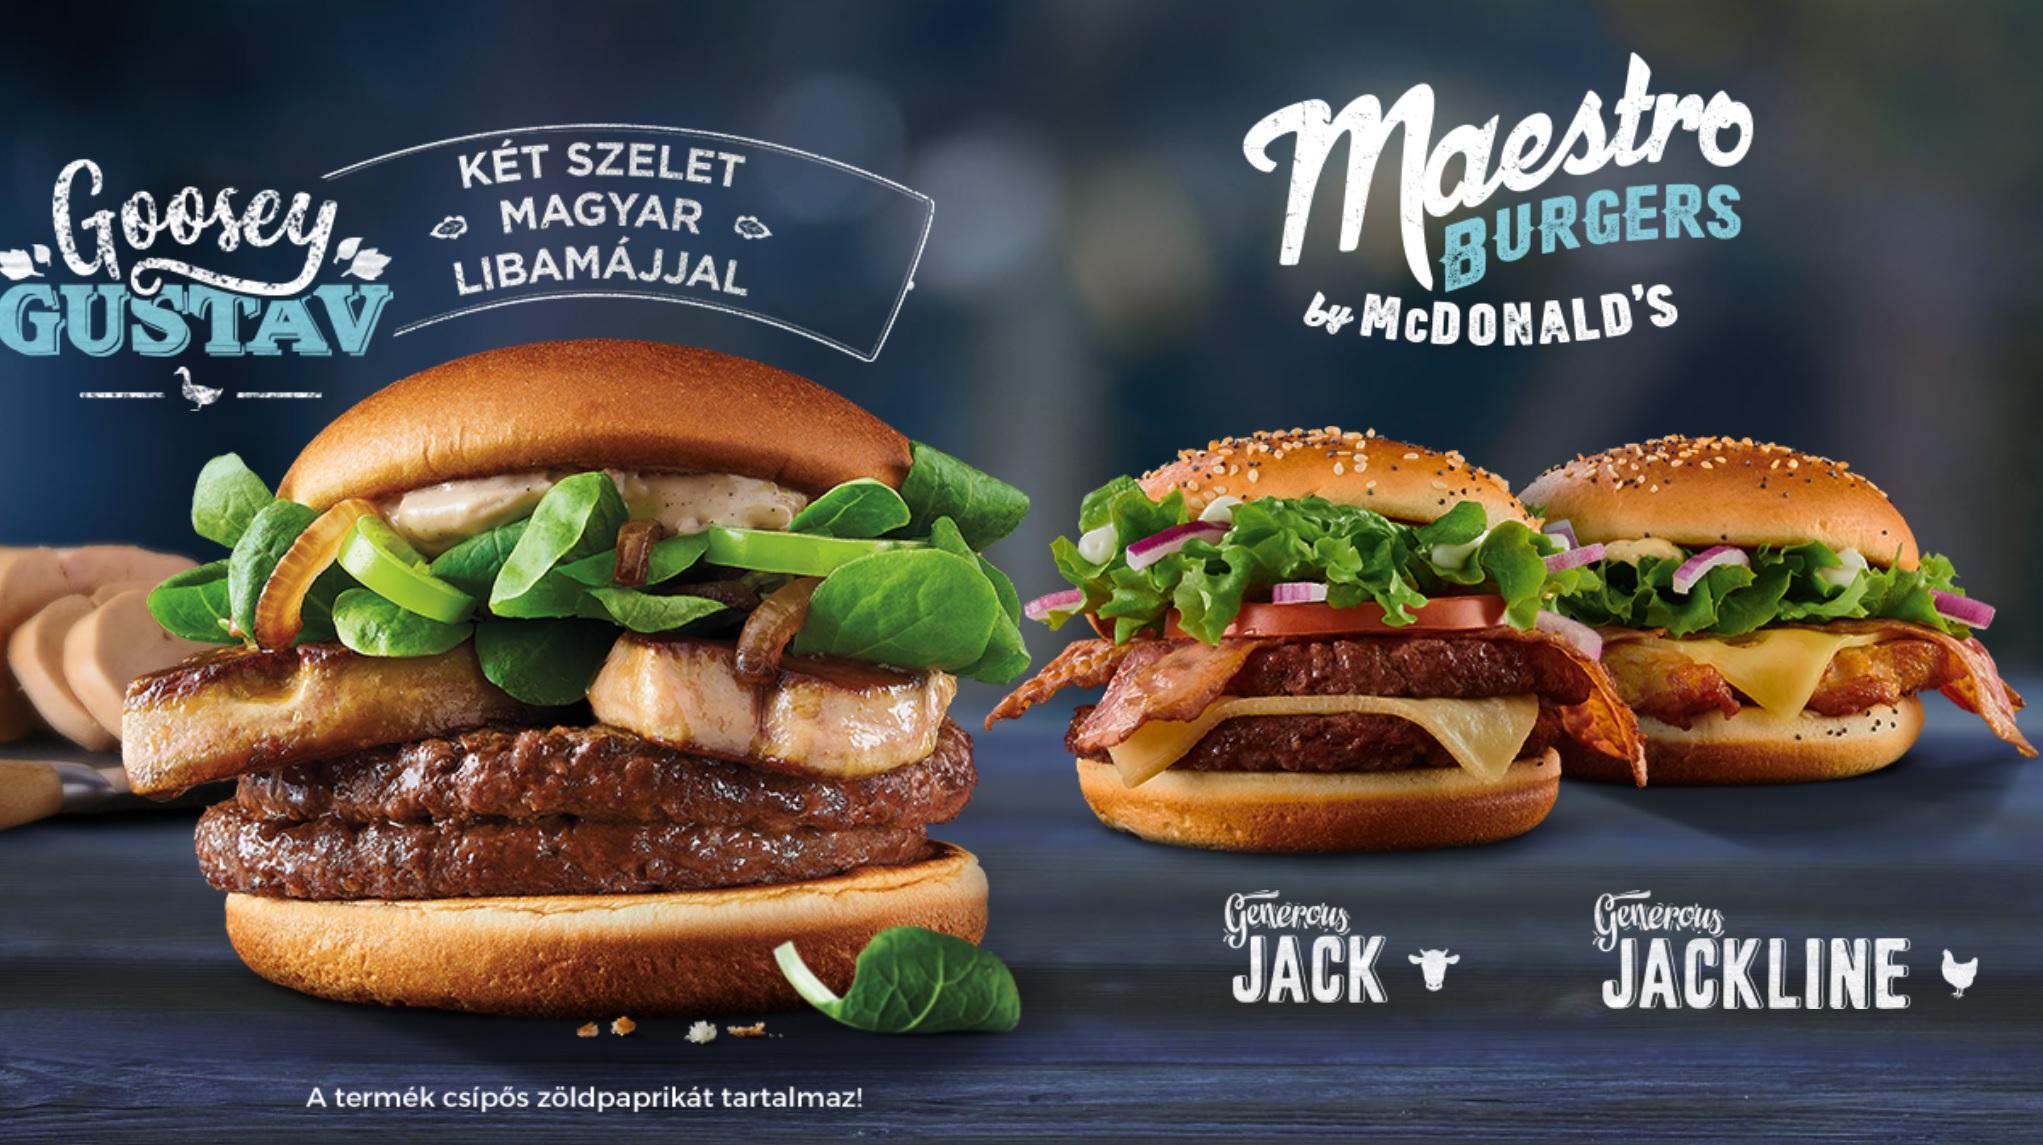 McDonald's Maestro Burgers - Hungary - Goosey Gustav